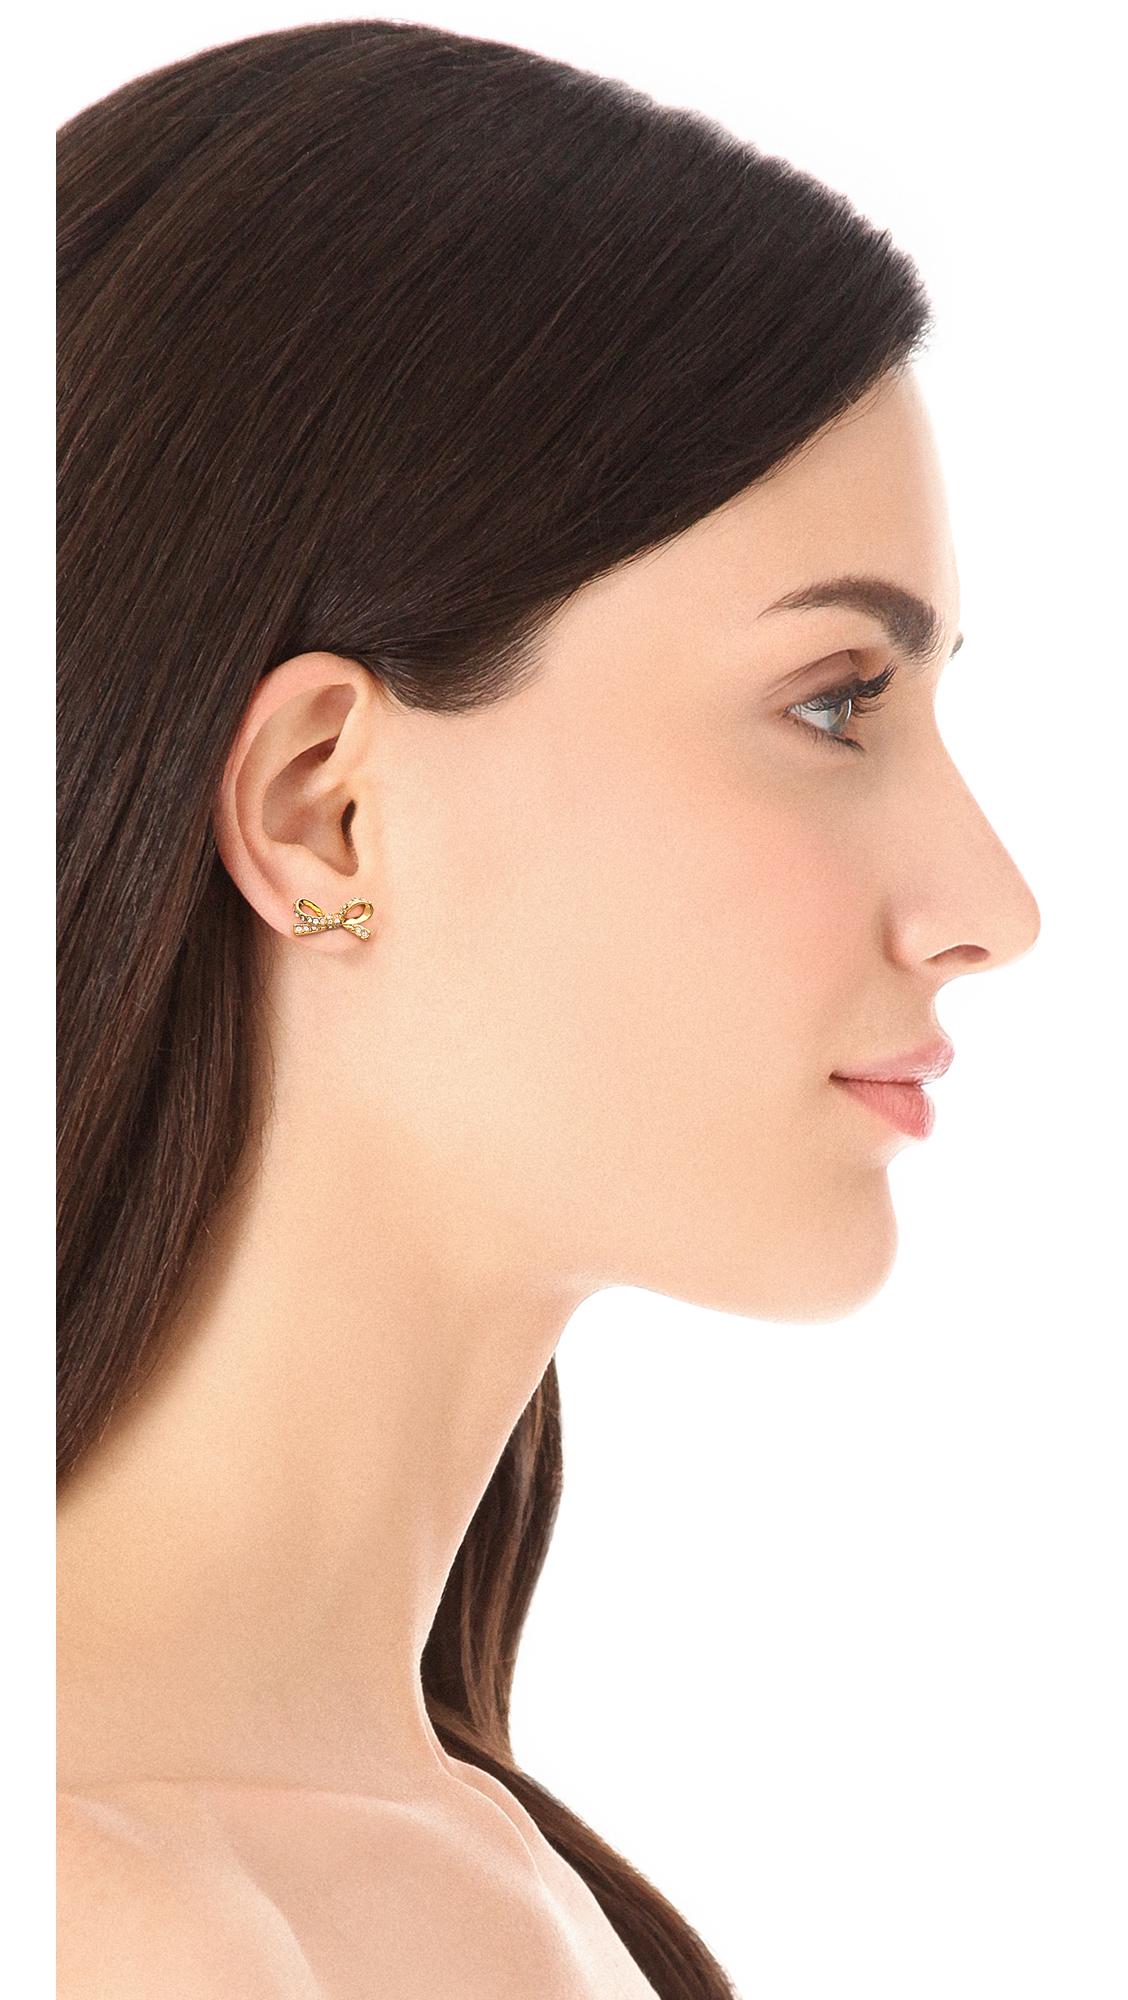 8e66ee0d2f3a Lyst - Kate Spade Skinny Mini Pave Bow Stud Earrings in Metallic